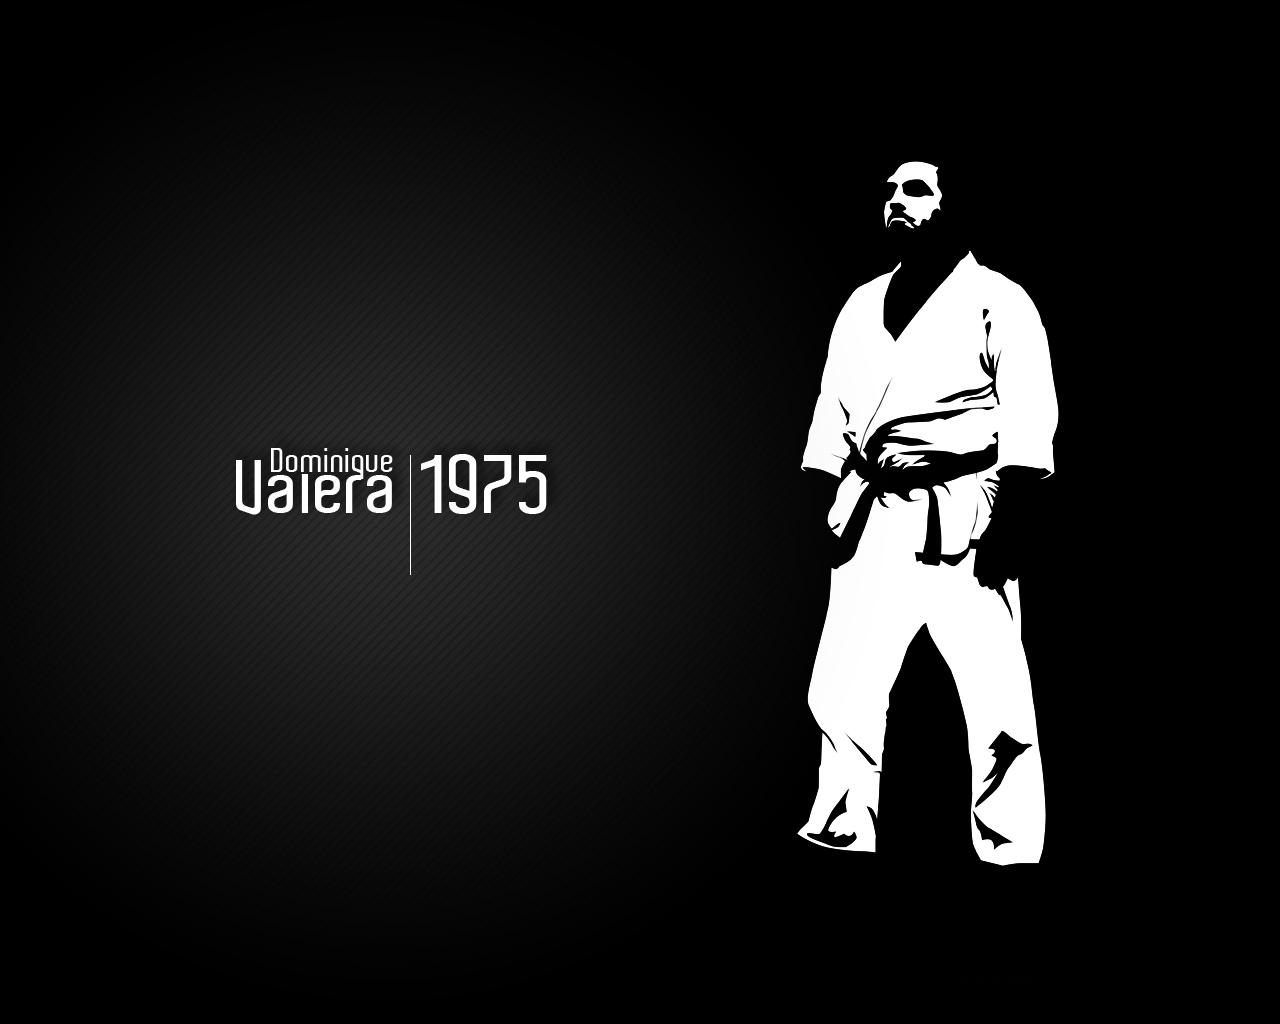 Kenpo Karate Wallpaper Kenpo karate wallpapers 1280x1024